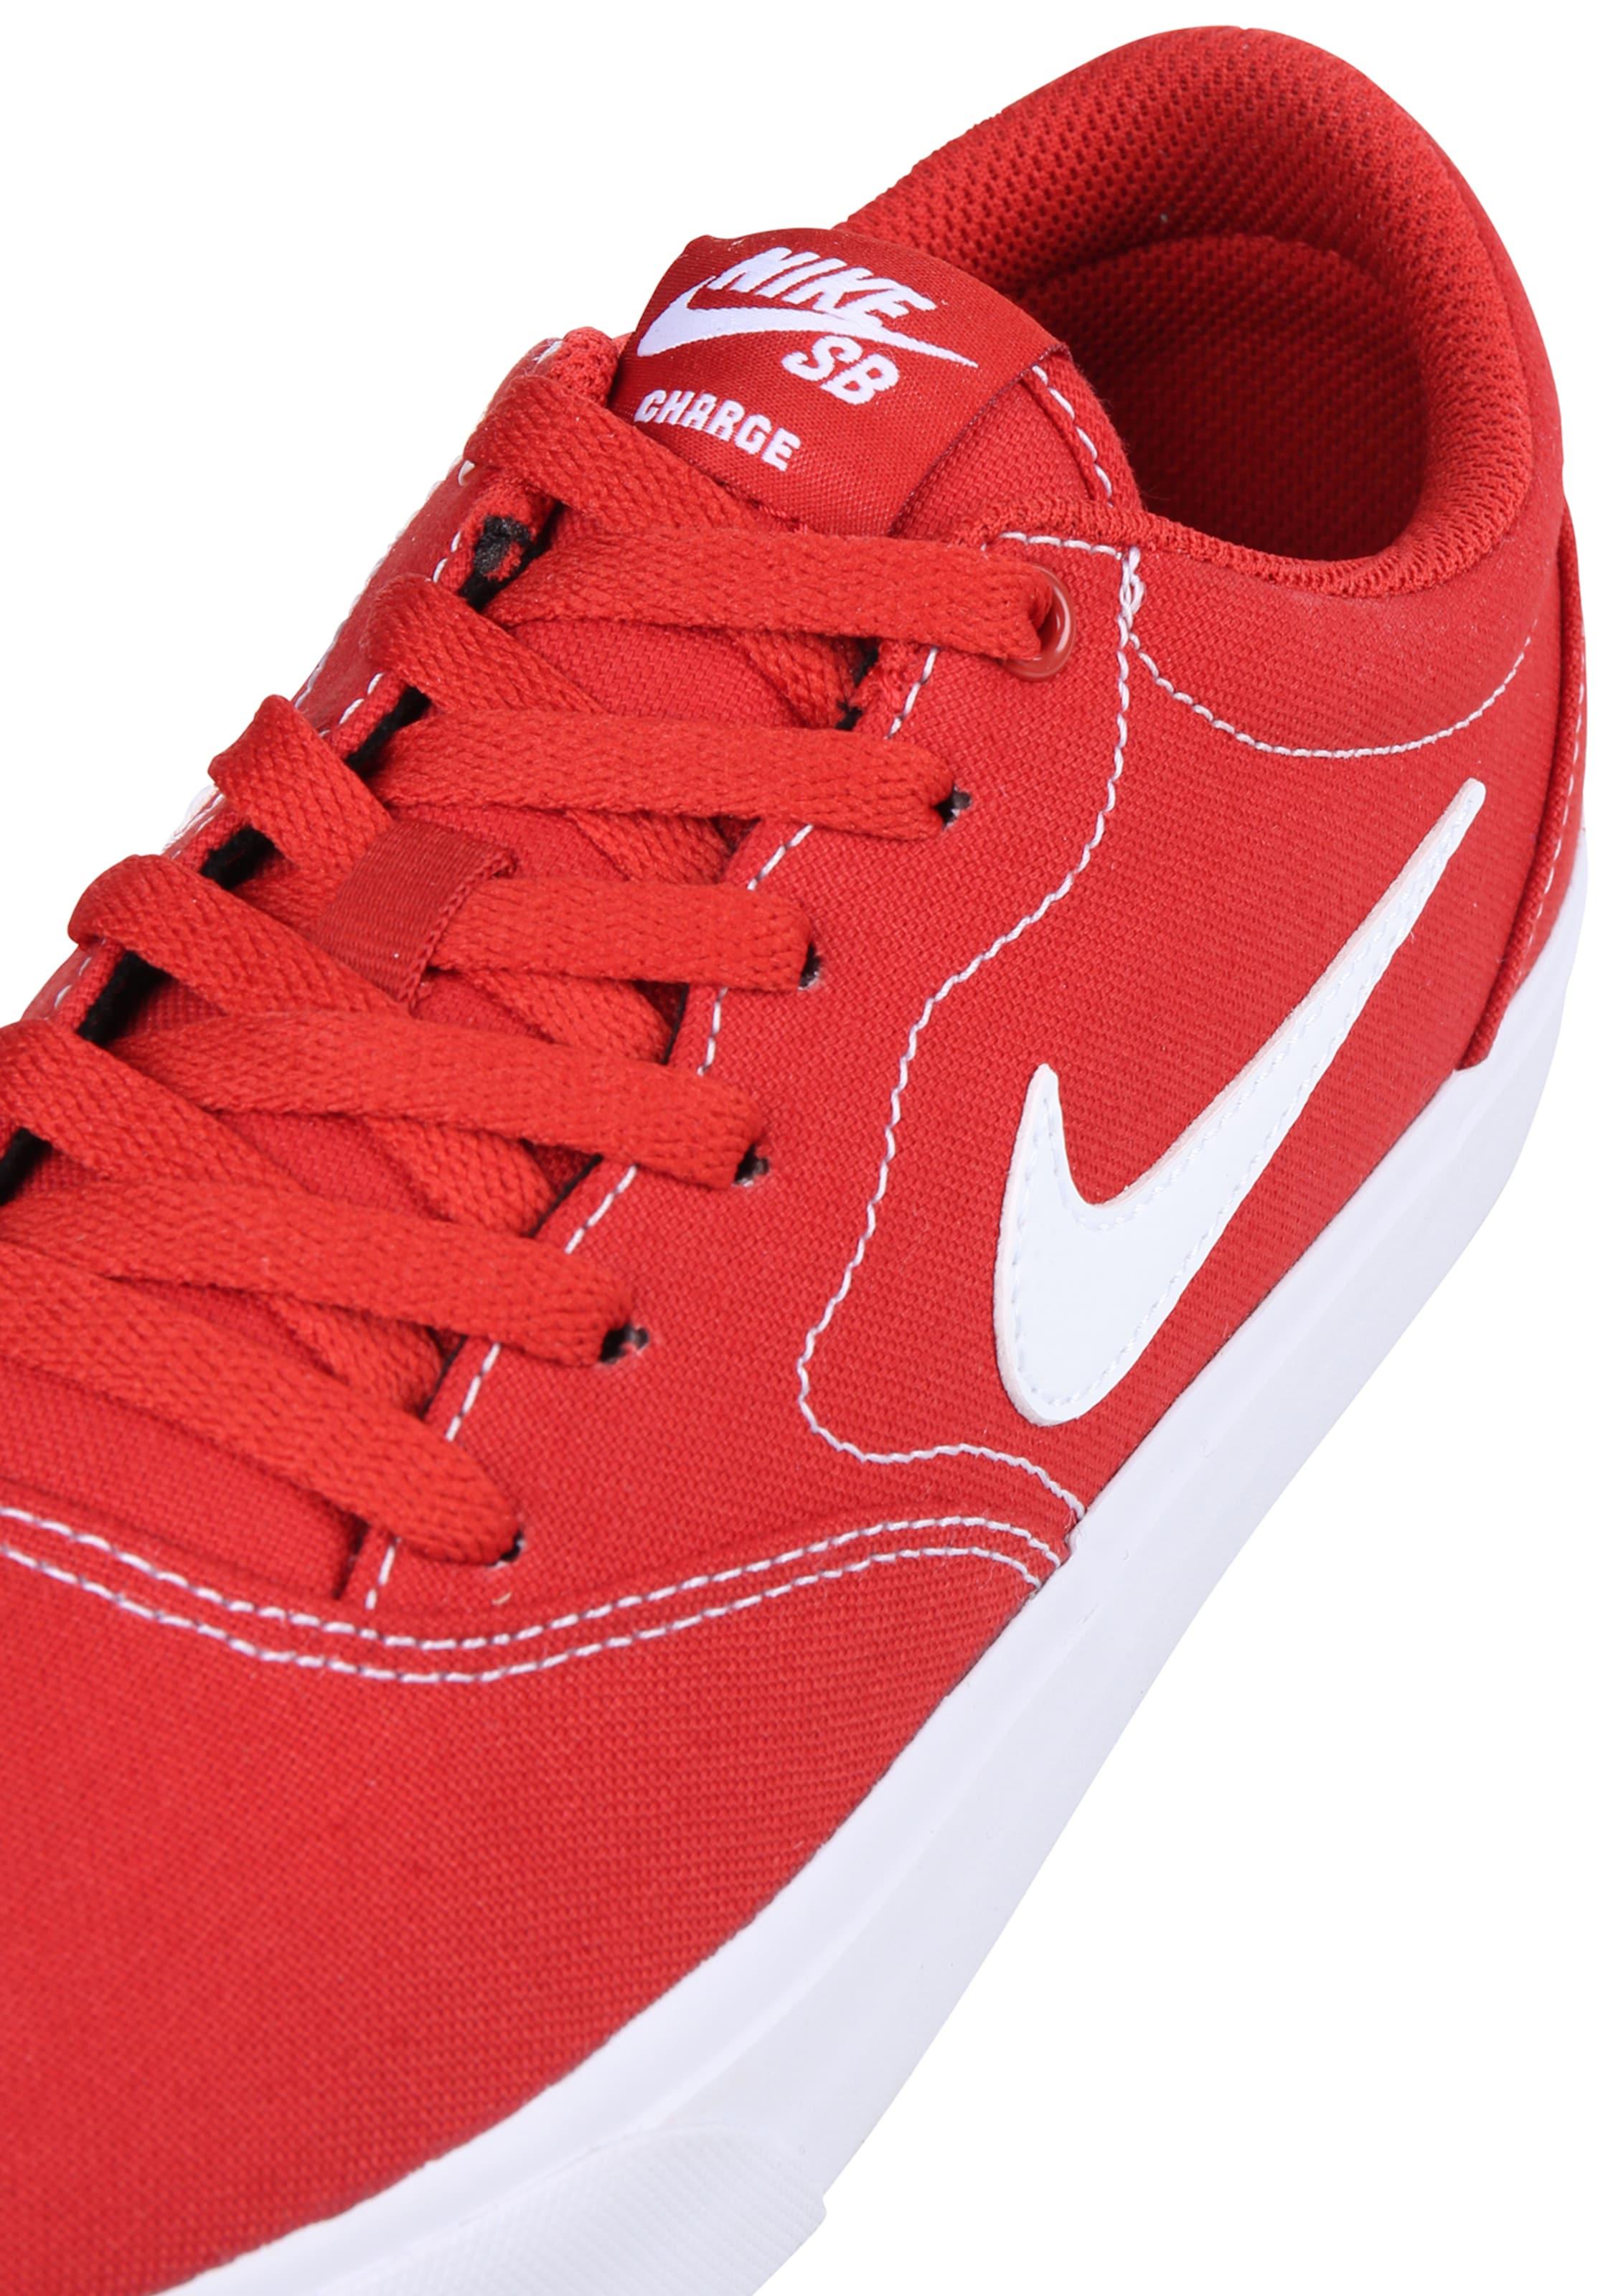 Nike SB Sneaker 'Charge' in blutrot